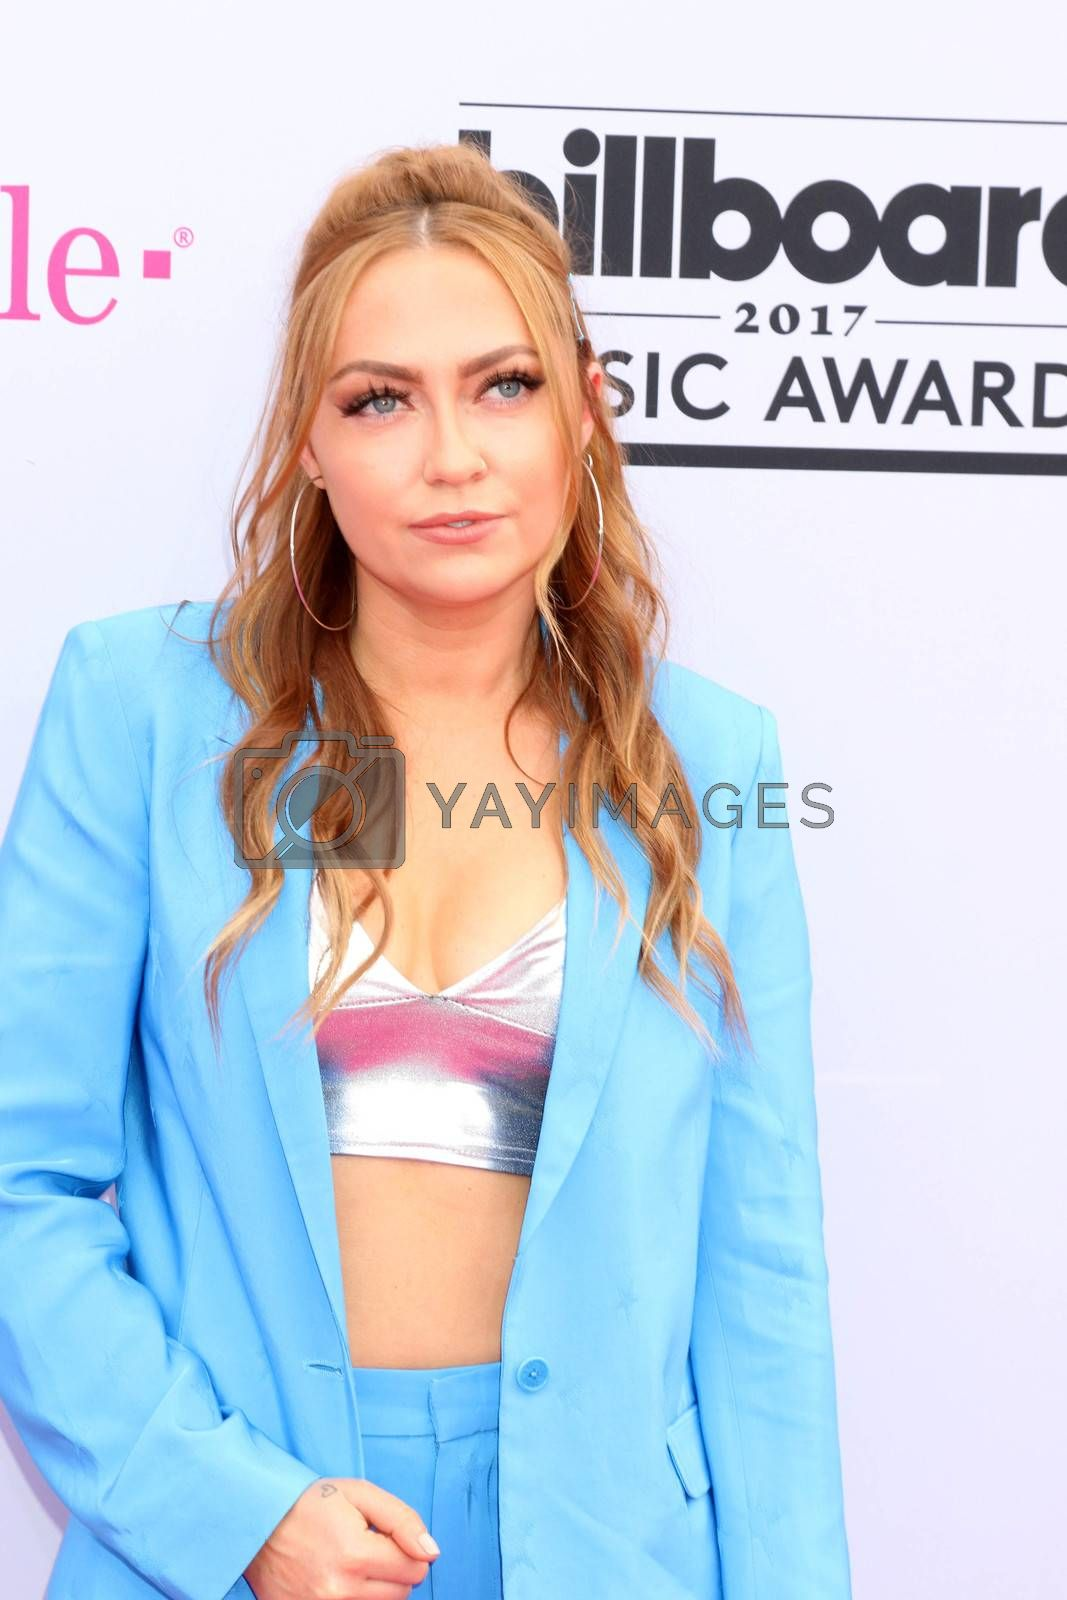 Brandi Cyrus at the 2017 Billboard Awards Arrivals, T-Mobile Arena, Las Vegas, NV 05-21-17